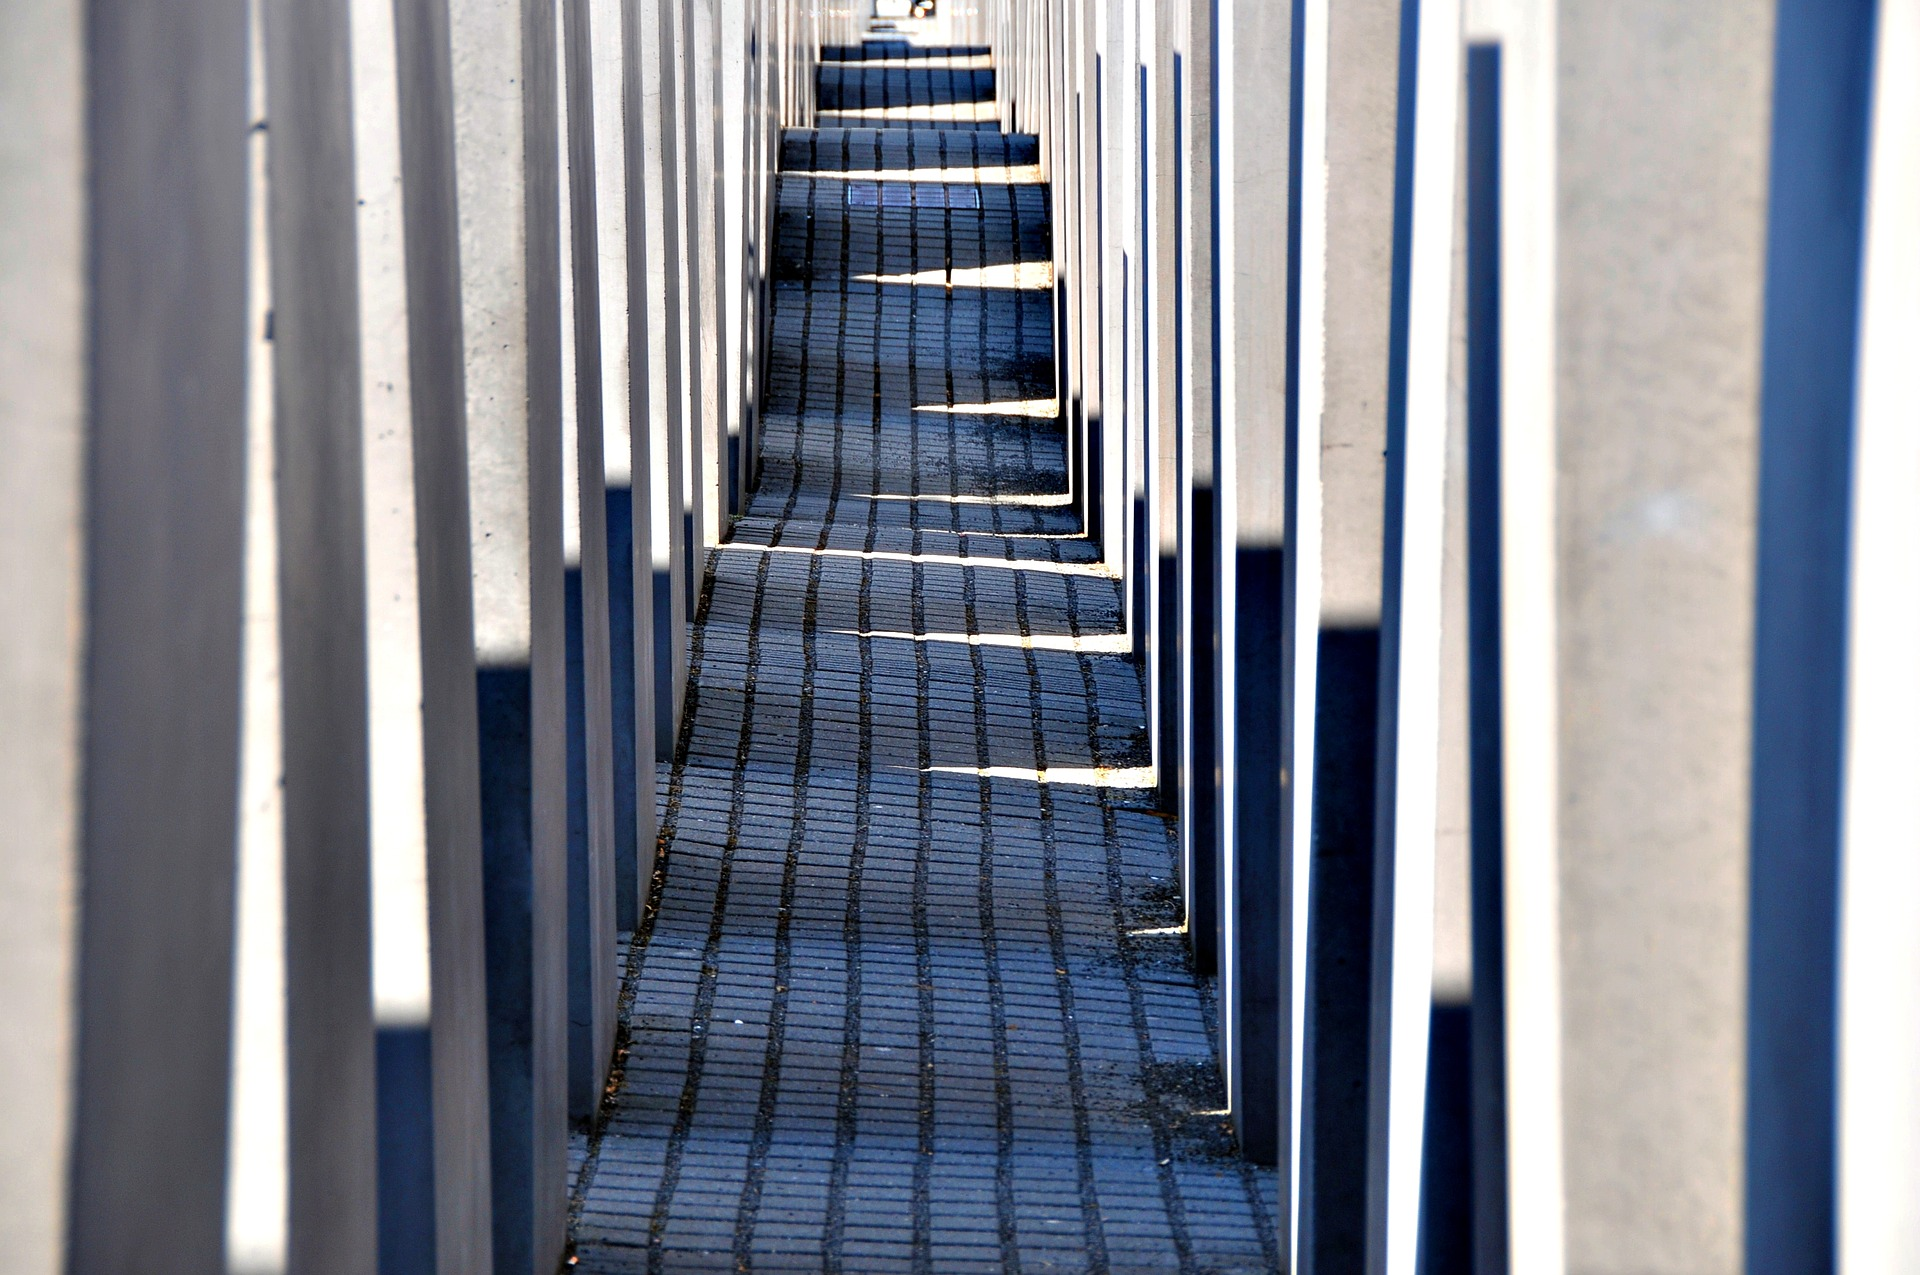 Centar Wiesenthal pohvalio Njemačku zbog procesuiranja bivših nacista